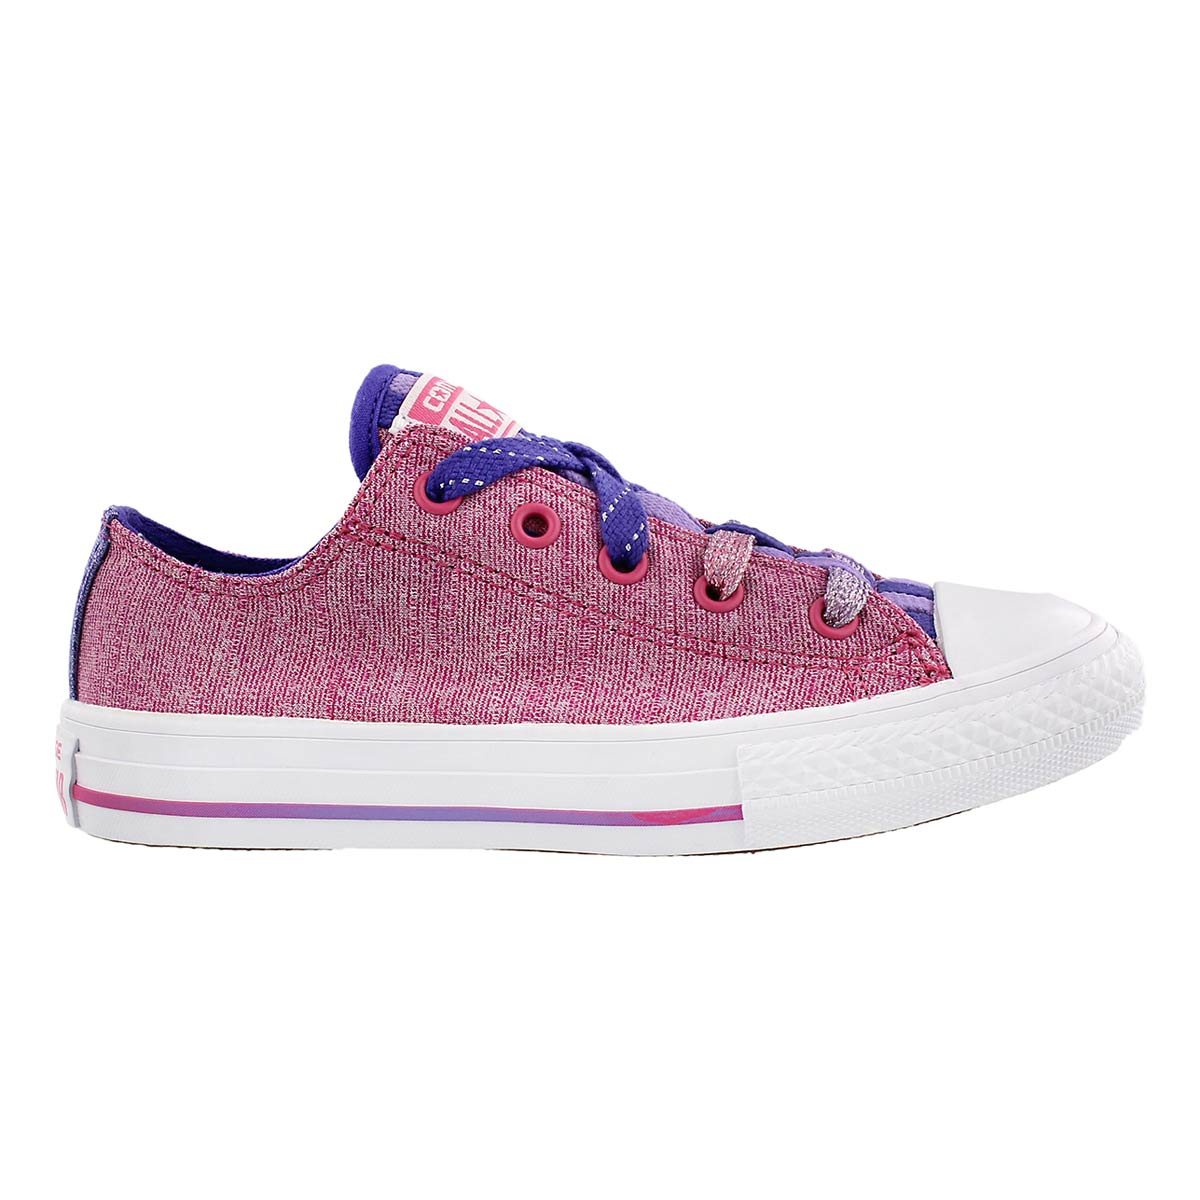 Grs CTAS Loopholes Ox pnk/grape sneaker